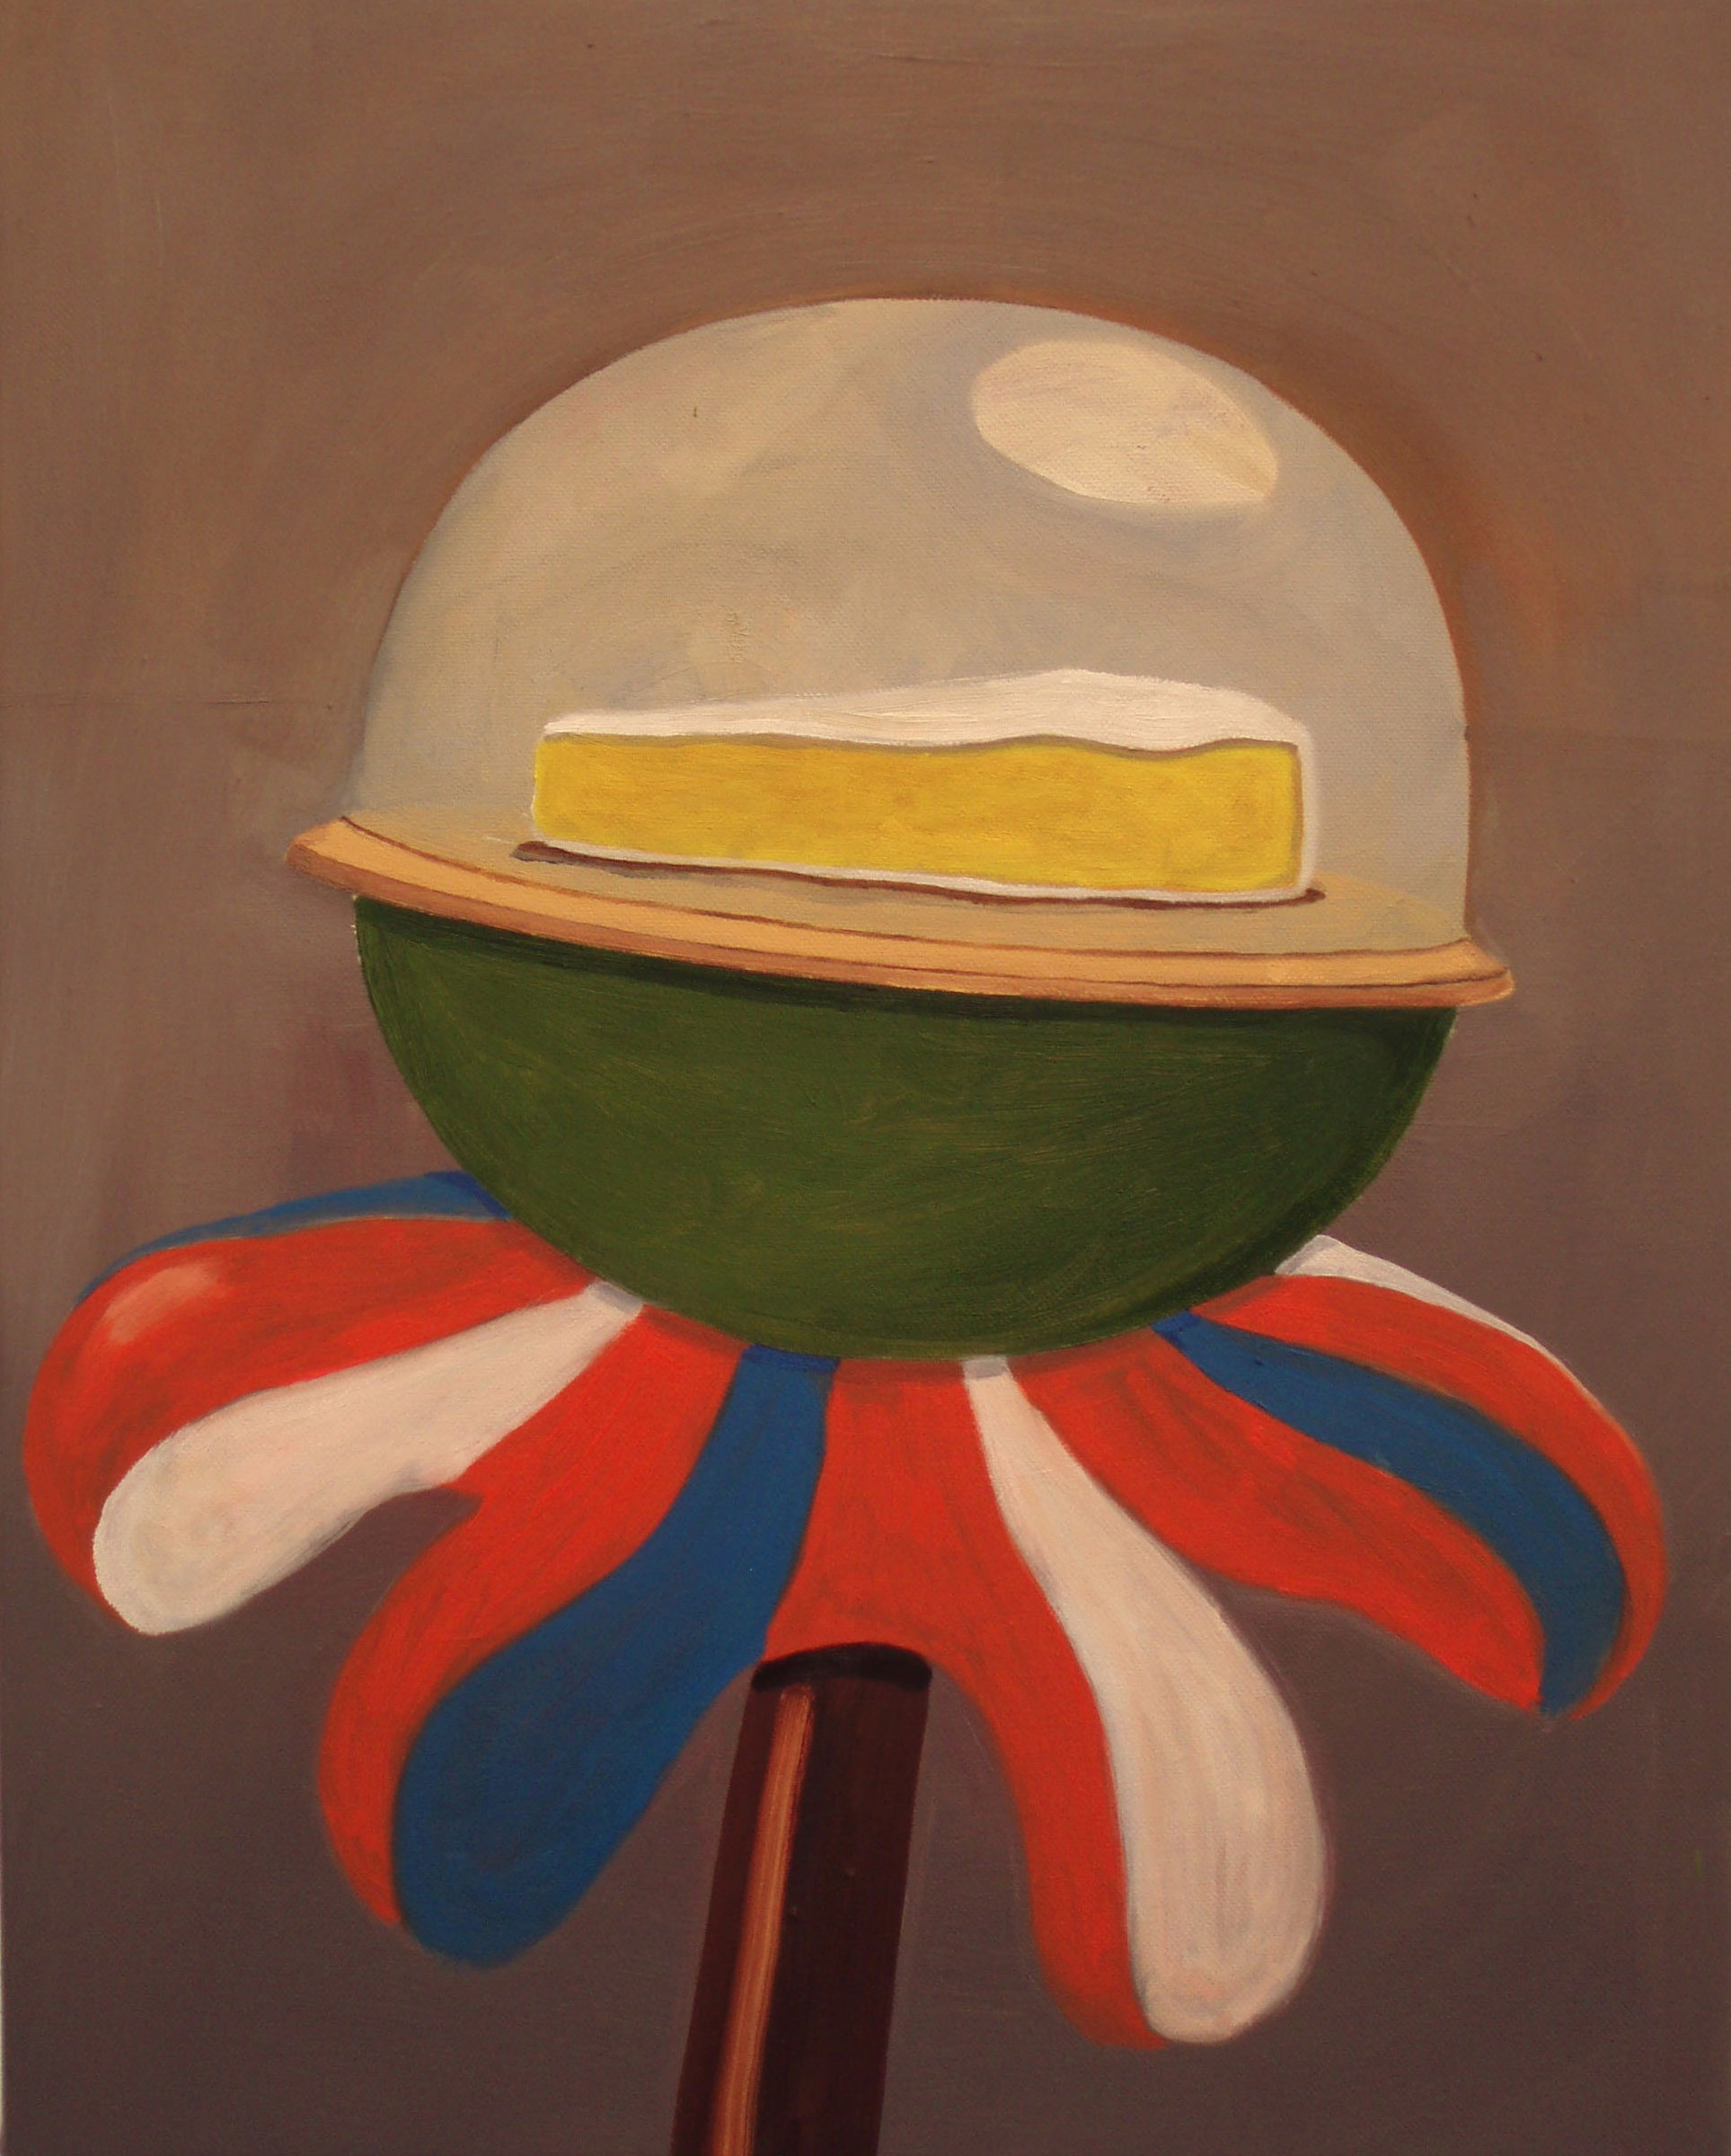 Sceptre  2008 Oil on Canvas, 50.5 x 40.5 cm